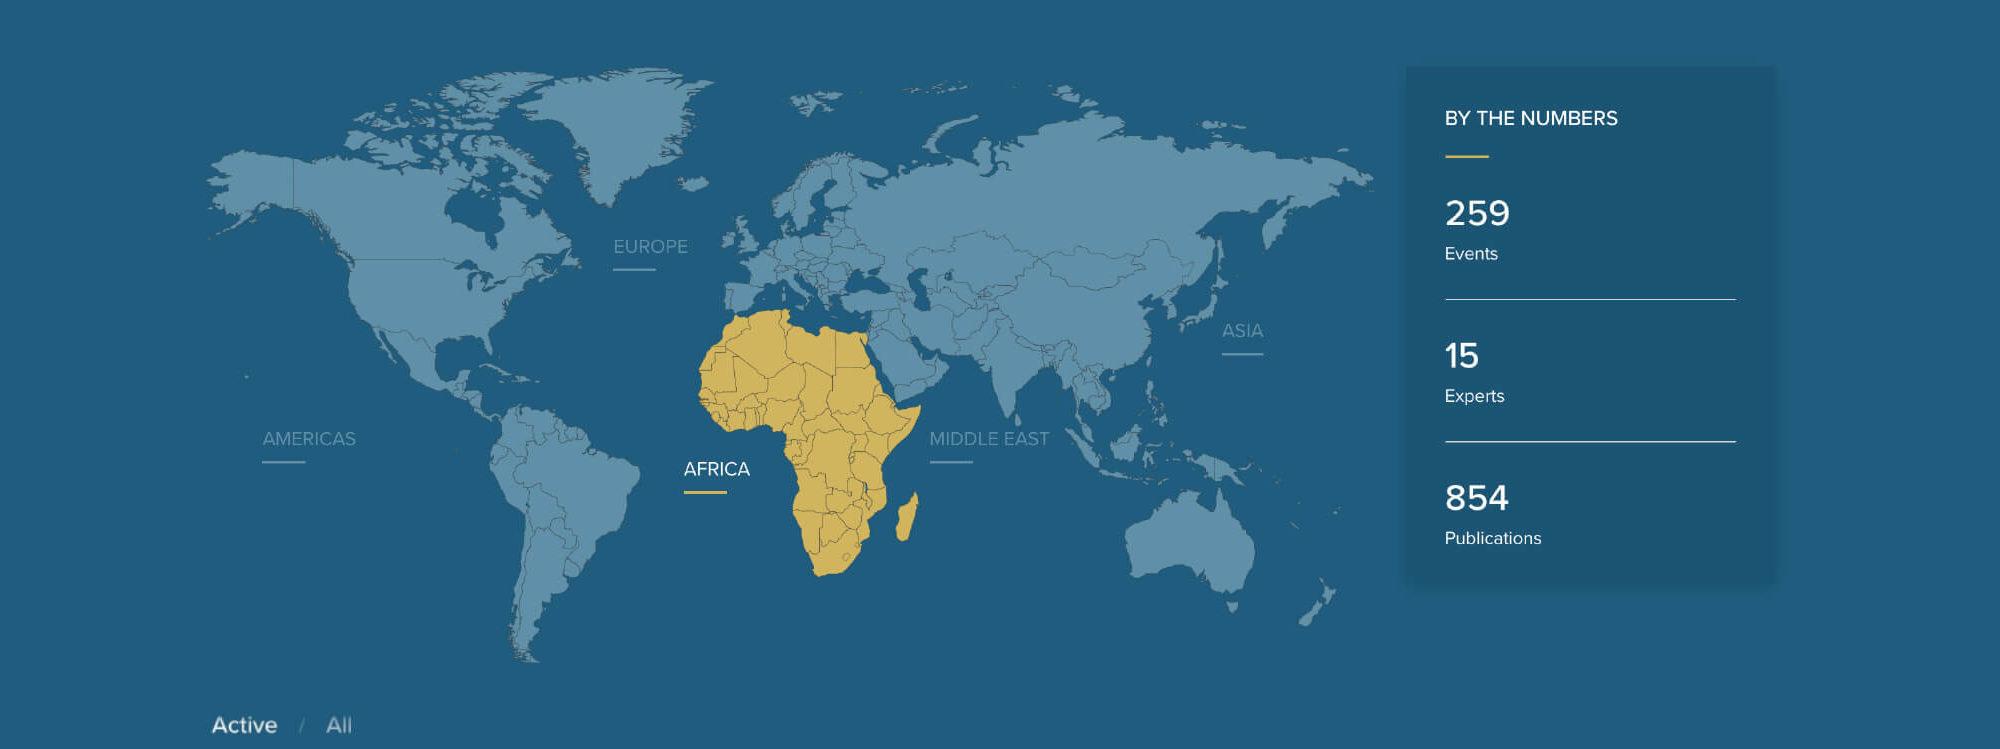 usip-map